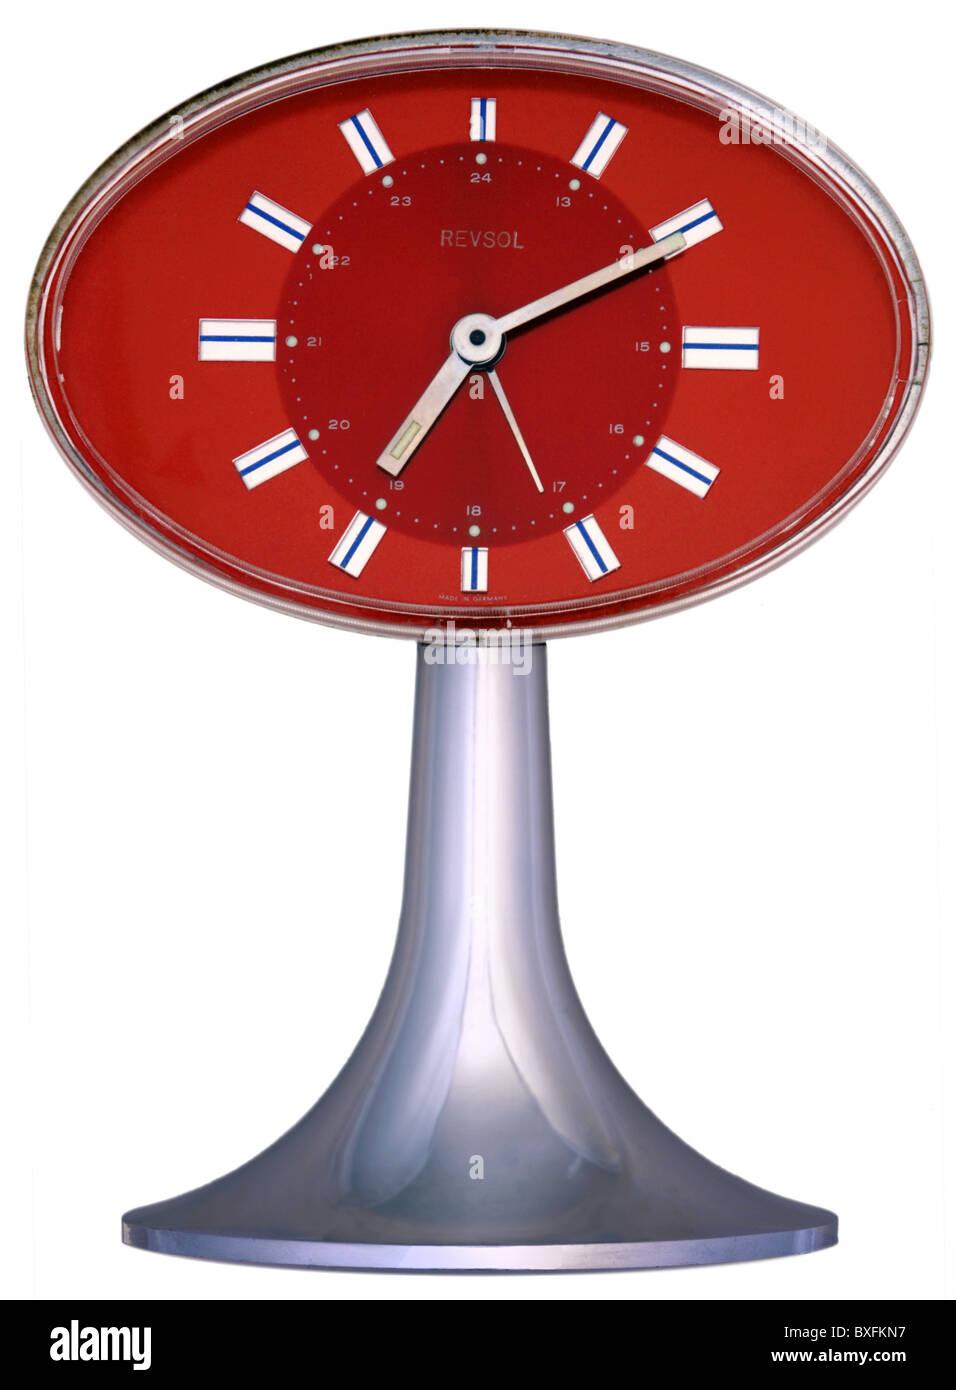 Table clocks stock photos table clocks stock images alamy clocks table clocks alarm clock revsol germany circa 1977 1970s gamestrikefo Gallery